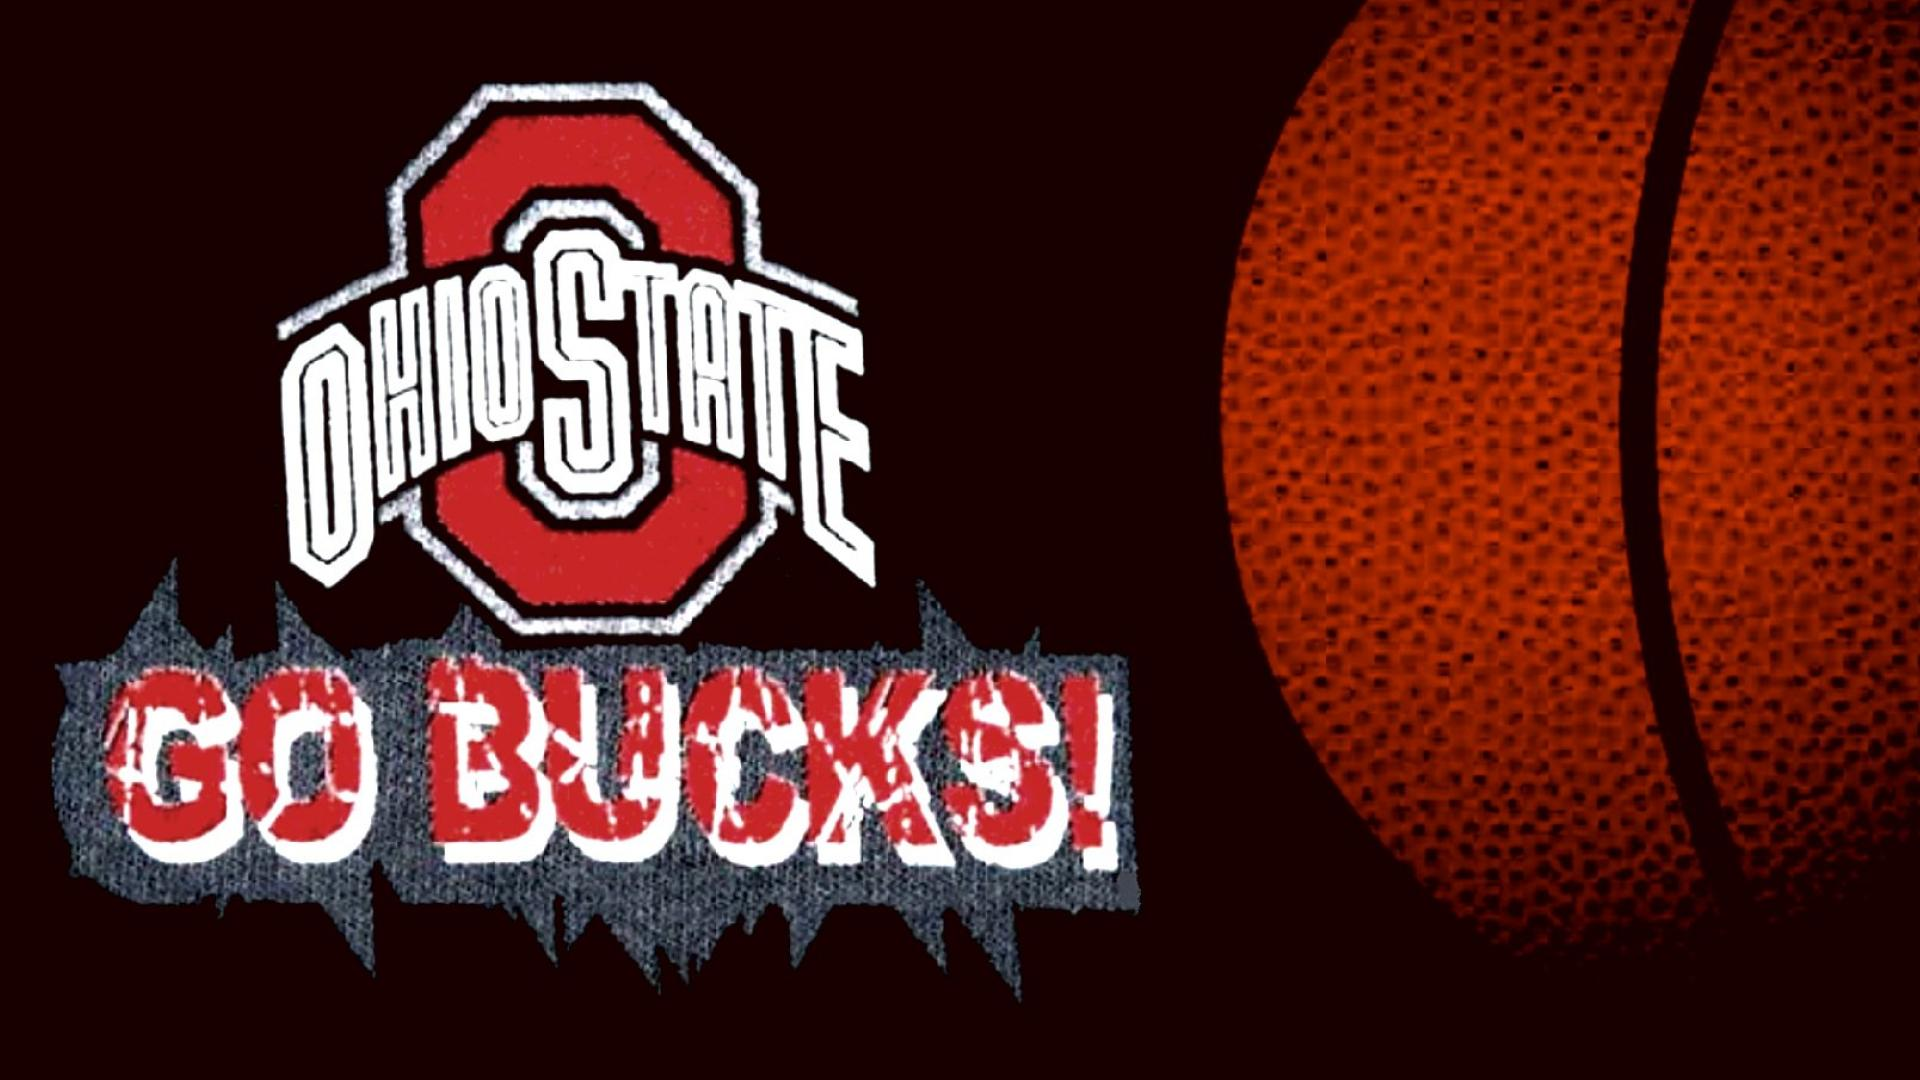 ohio state university desktop wallpaper